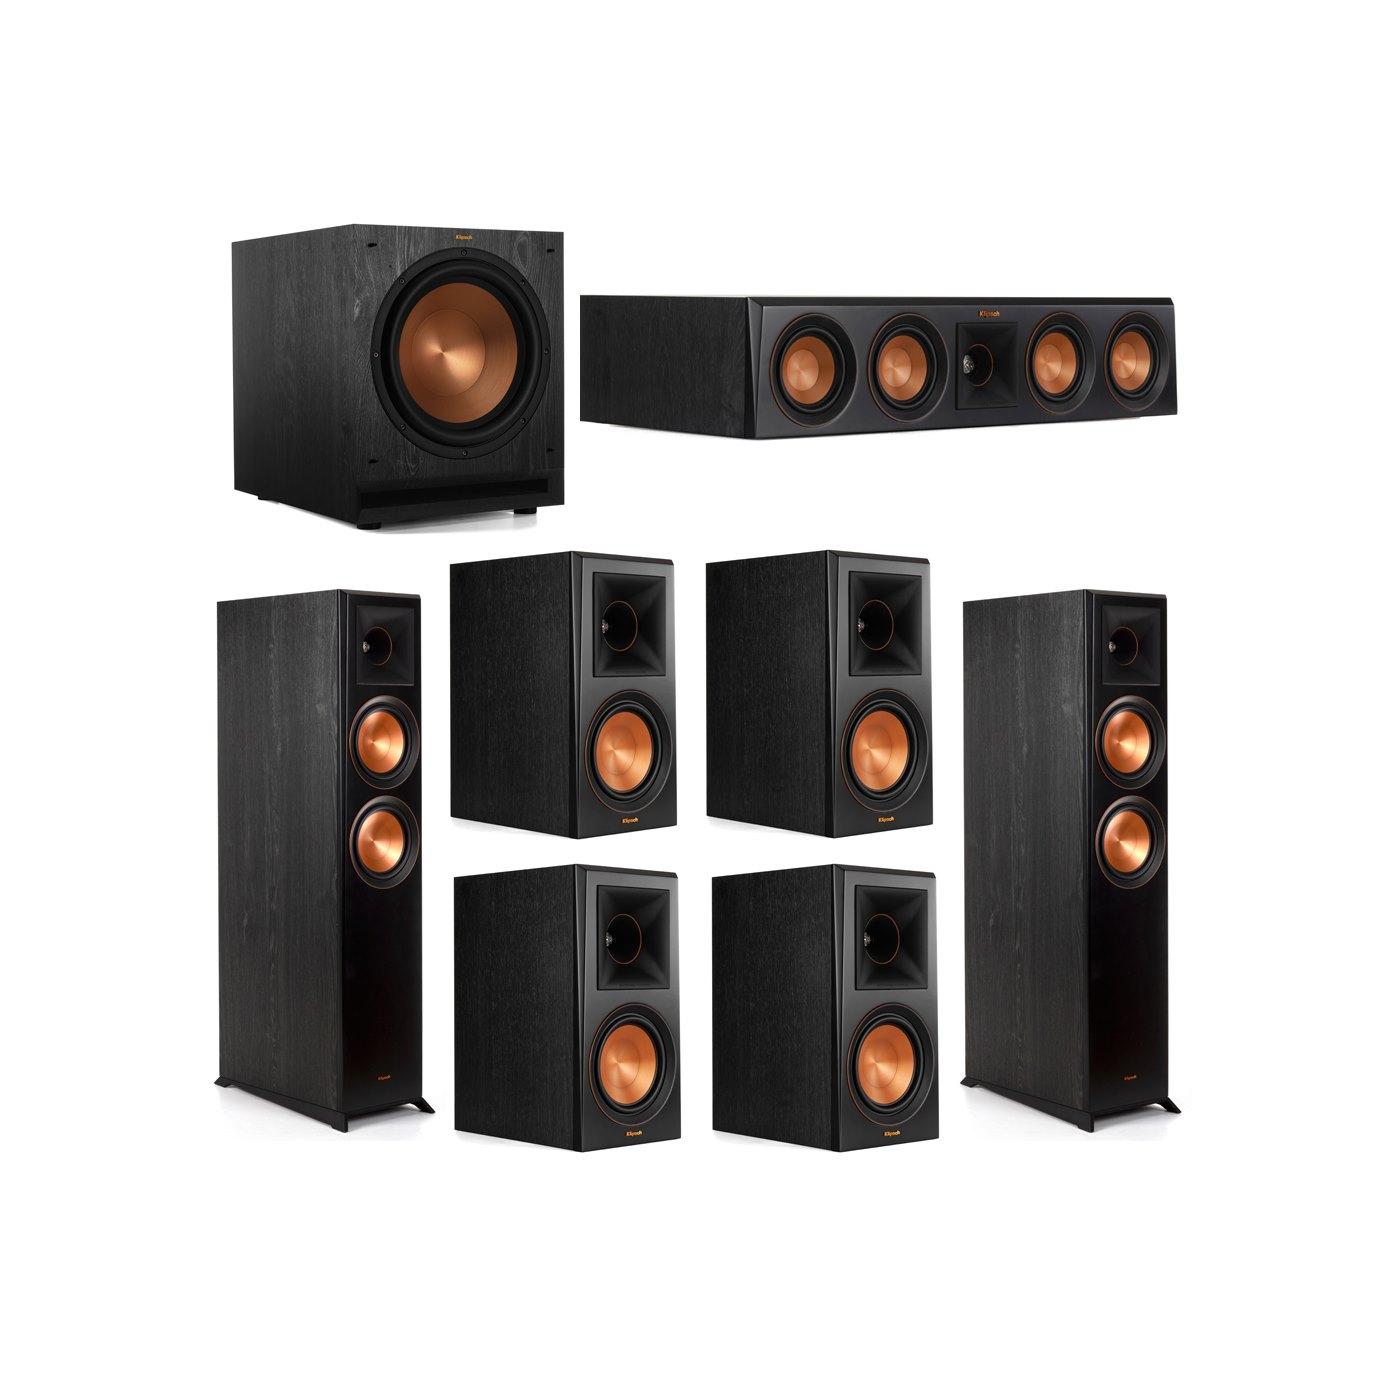 Klipsch 7.1 System with 2 RP-6000F Floorstanding Speakers, 1 Klipsch RP-404C Center Speaker, 4 Klipsch RP-600M Surround Speakers, 1 Klipsch SPL-120 Subwoofer